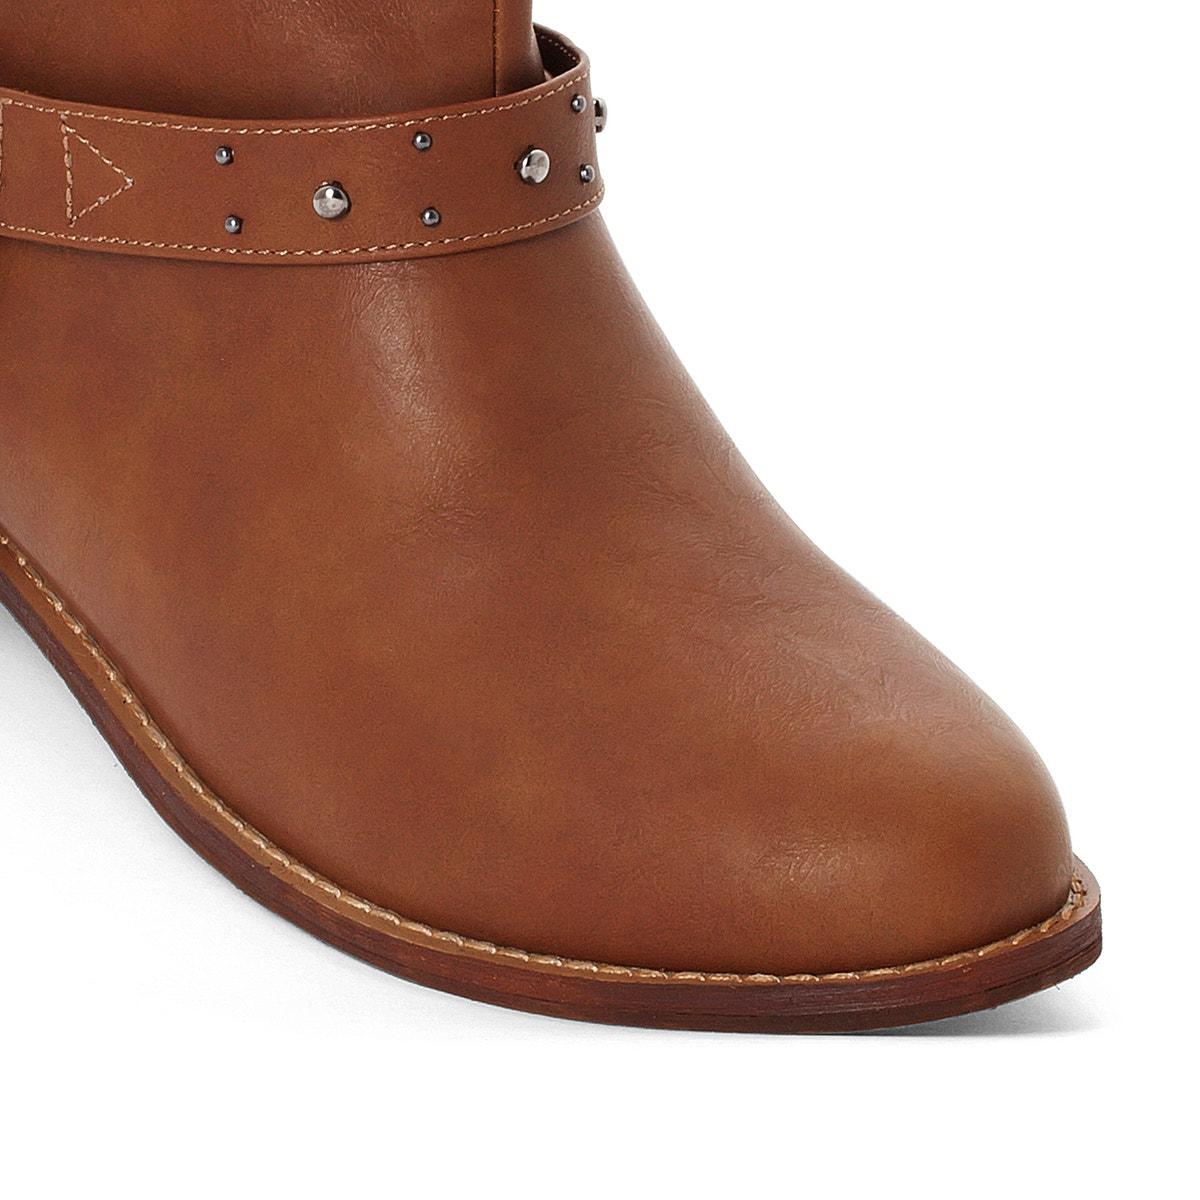 Castaluna Damenschuhe Größes Biker Stiefel Wide Fit, Größes Damenschuhe 38-45 b259f4